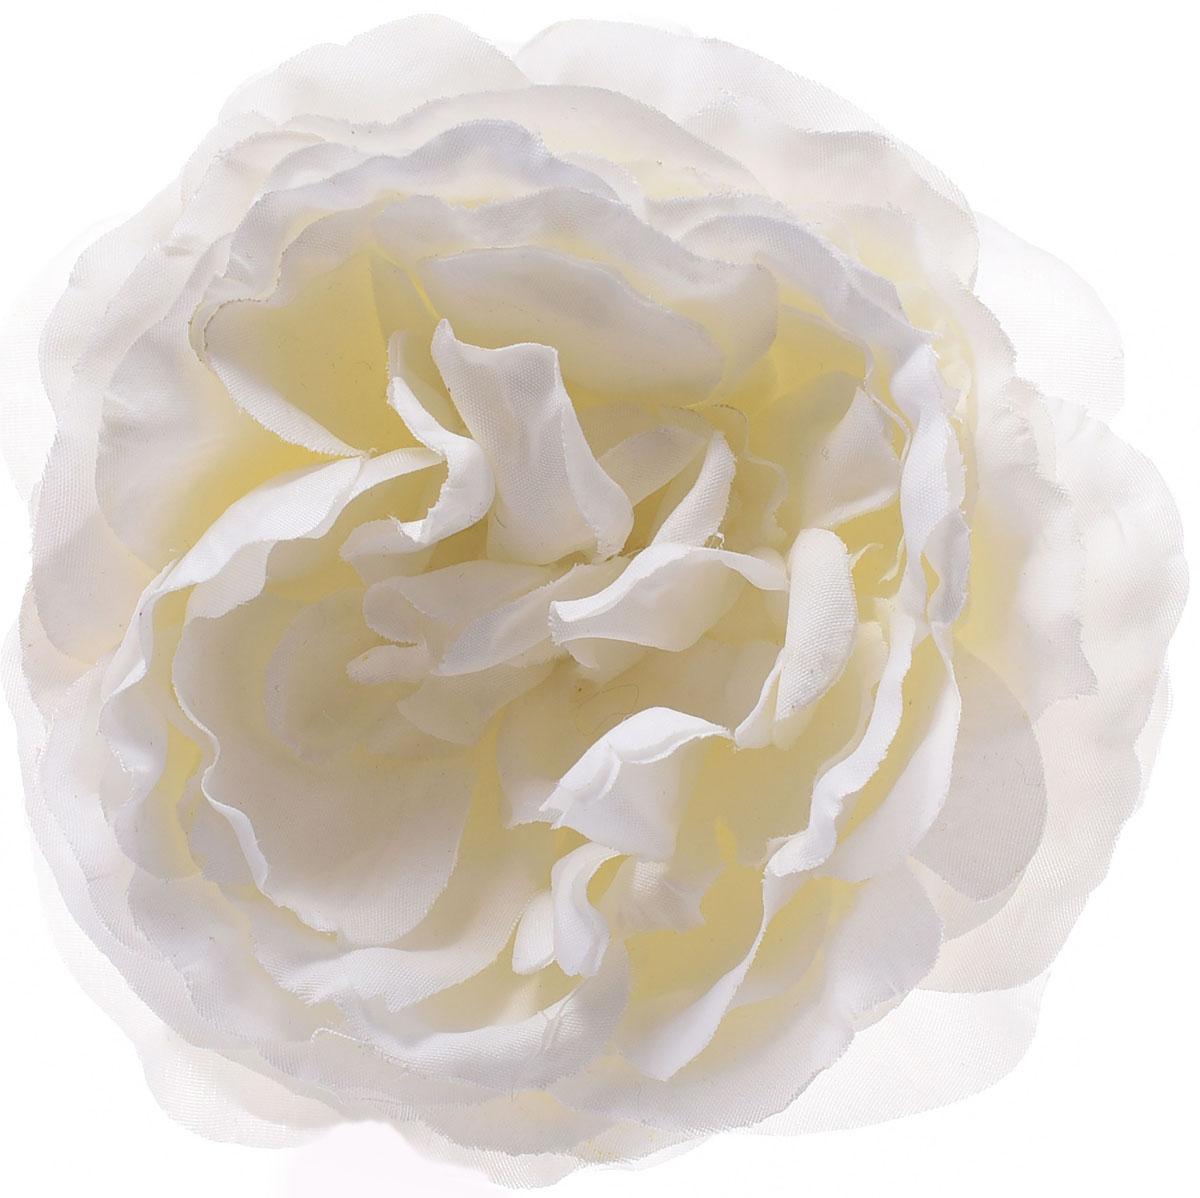 Резинка для волос Malina By Андерсен Скарлет, цвет: белый. 11812рб0111812рб01